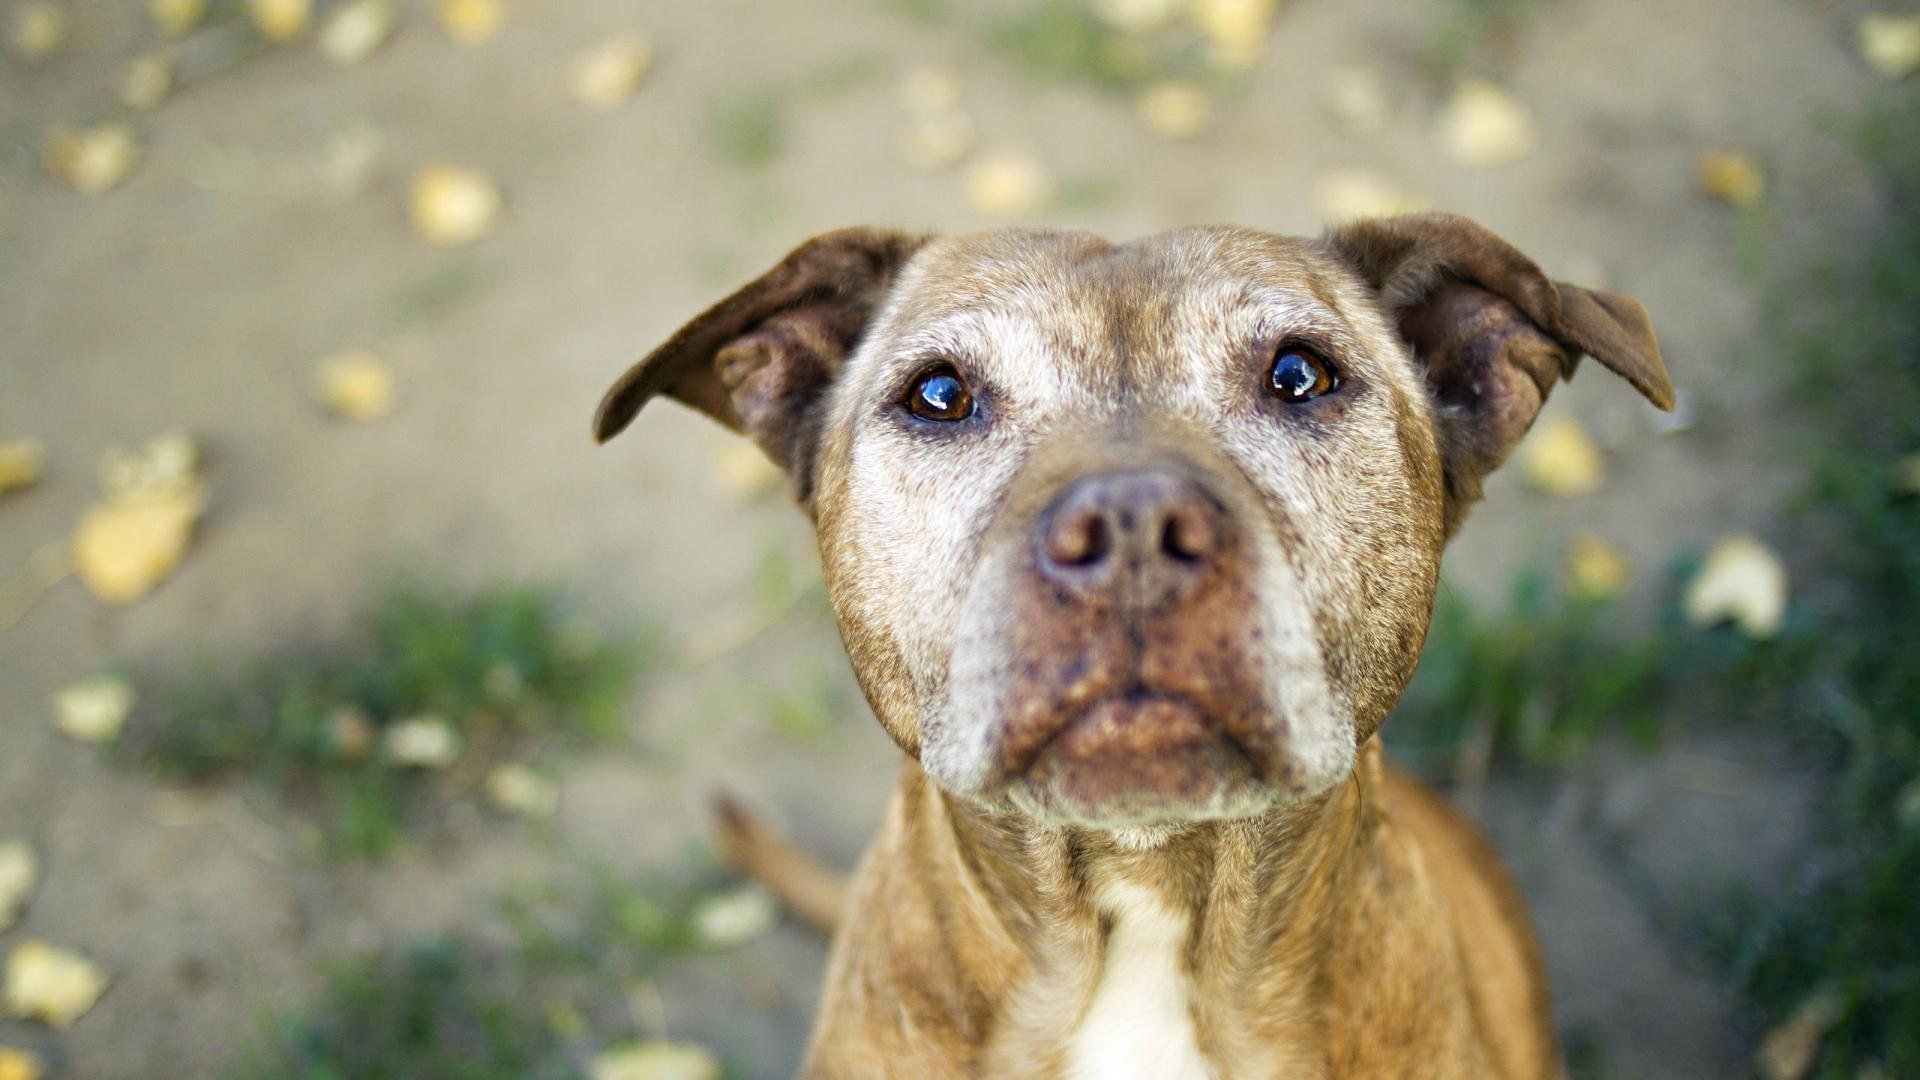 Cute Dog Pitbull Puppies HD Wallpaper Cute Dog Pitbull Puppies 1920x1080